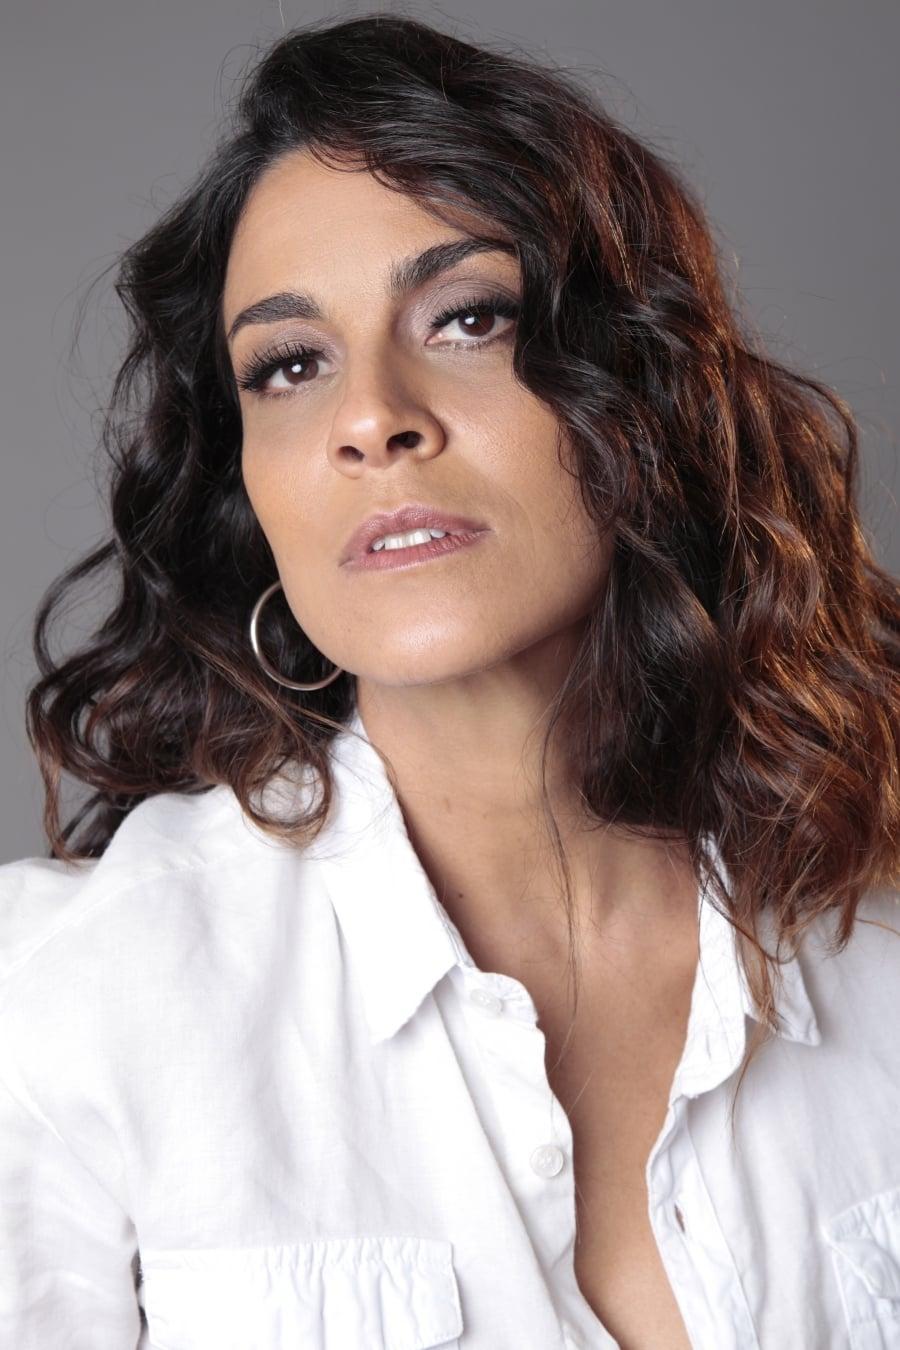 Izabella Bicalho